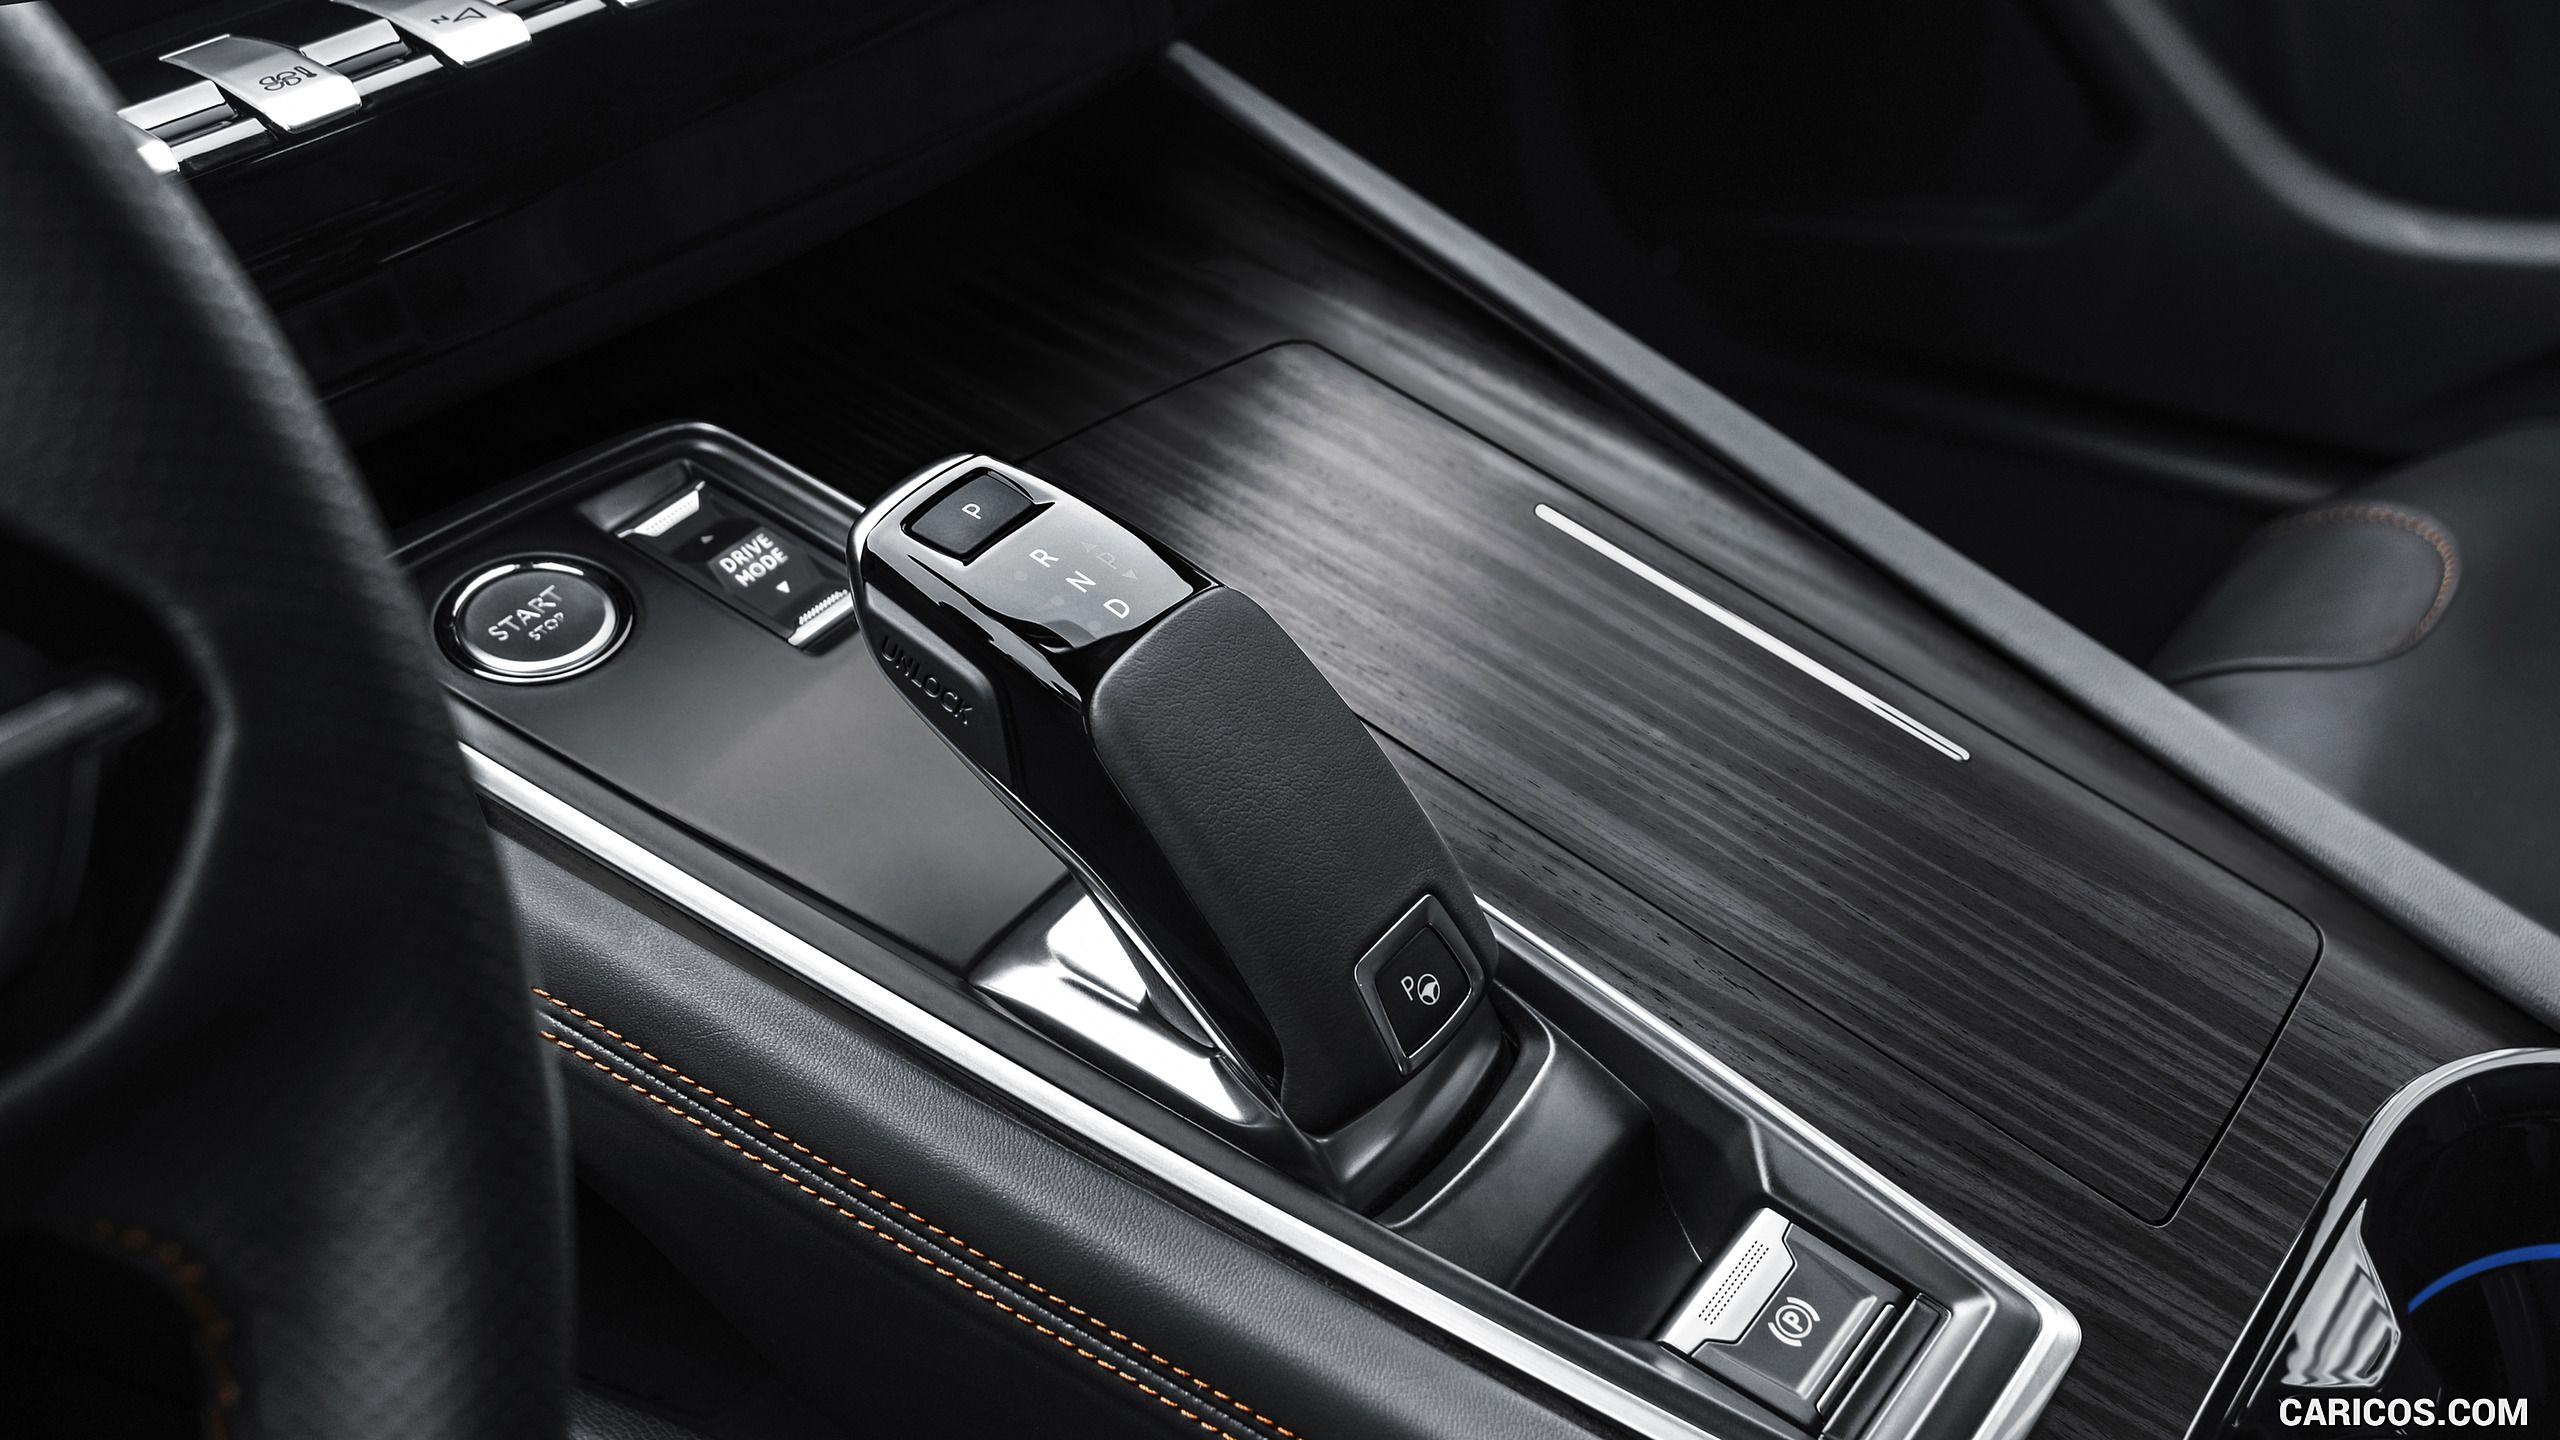 2019 Peugeot 508 Interior Detail Hd Peugeot 508 Peugeot